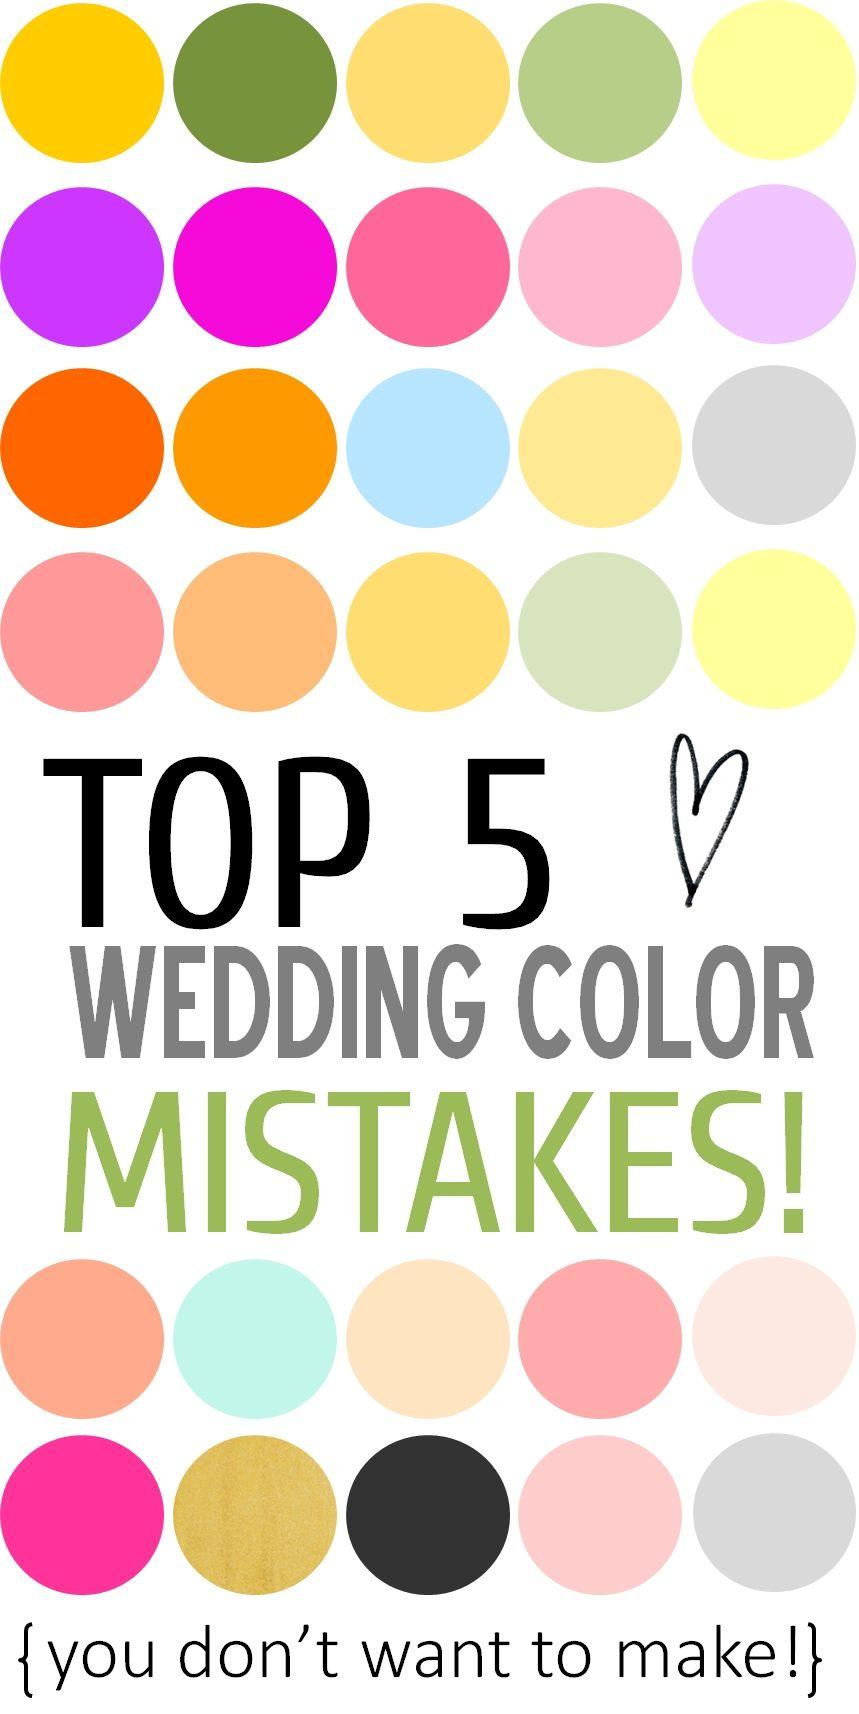 Wonderful Top 5 Wedding Color Mistakes + Ways To Avoid Them! Amazing Design